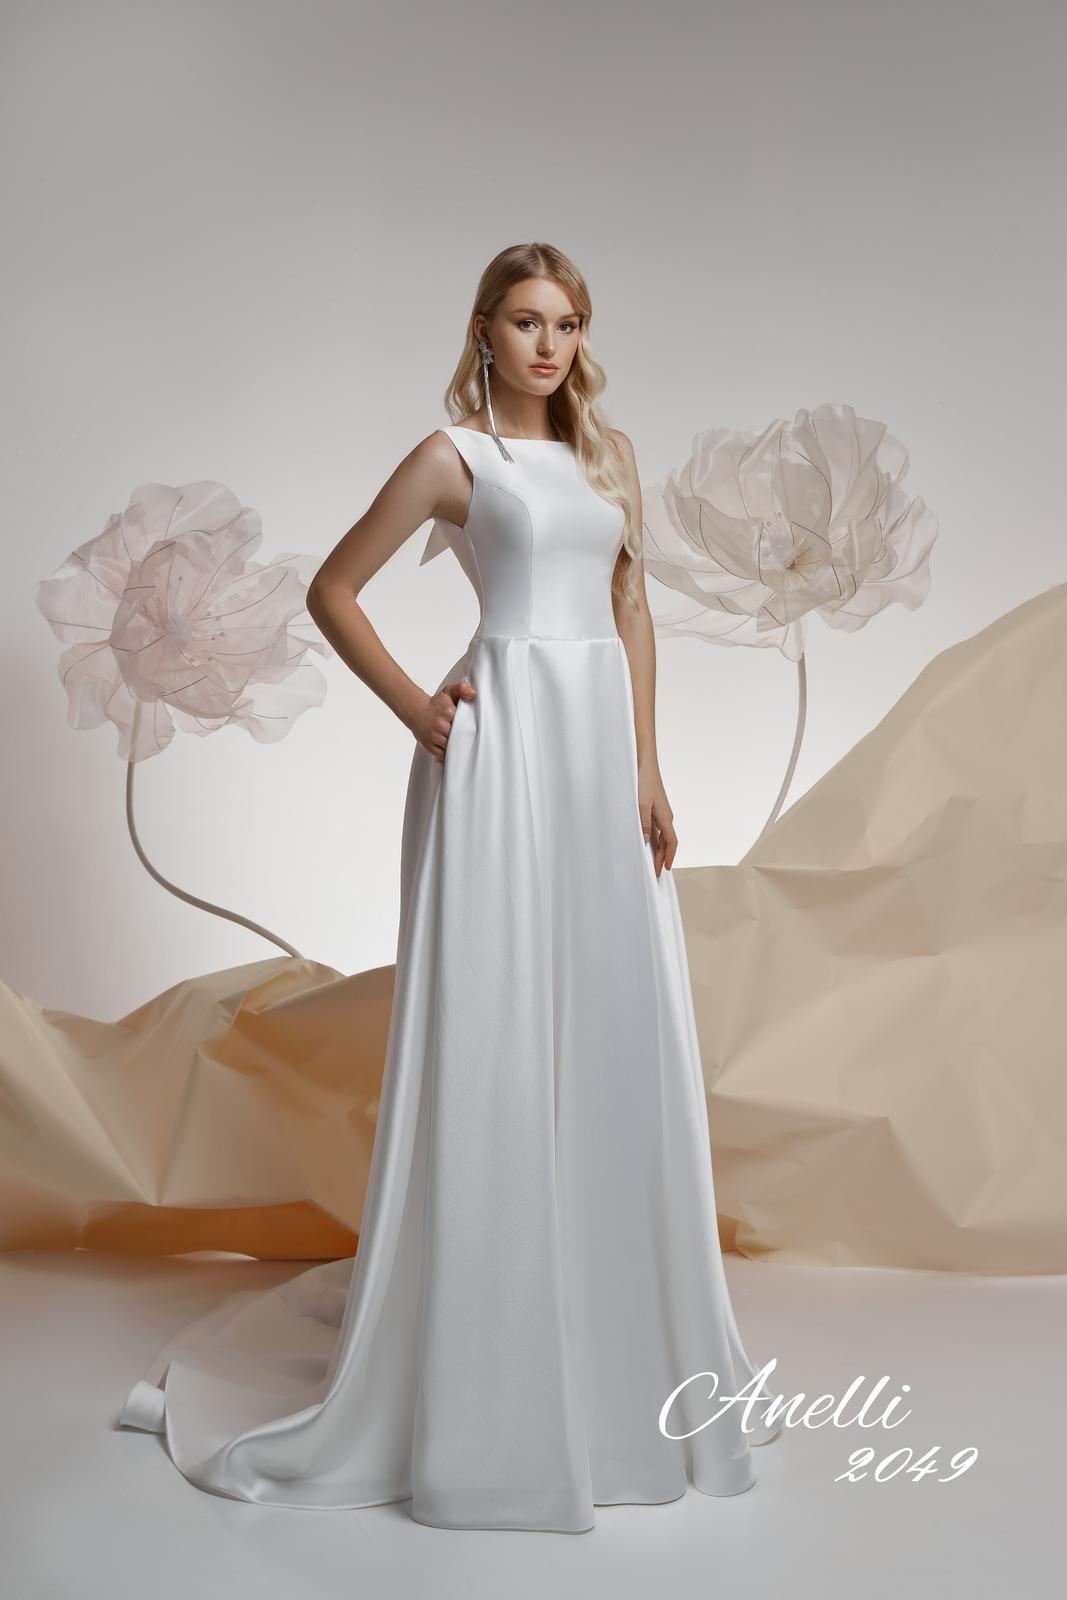 Svadobné šaty - Imagine 2049 - Obrázok č. 1